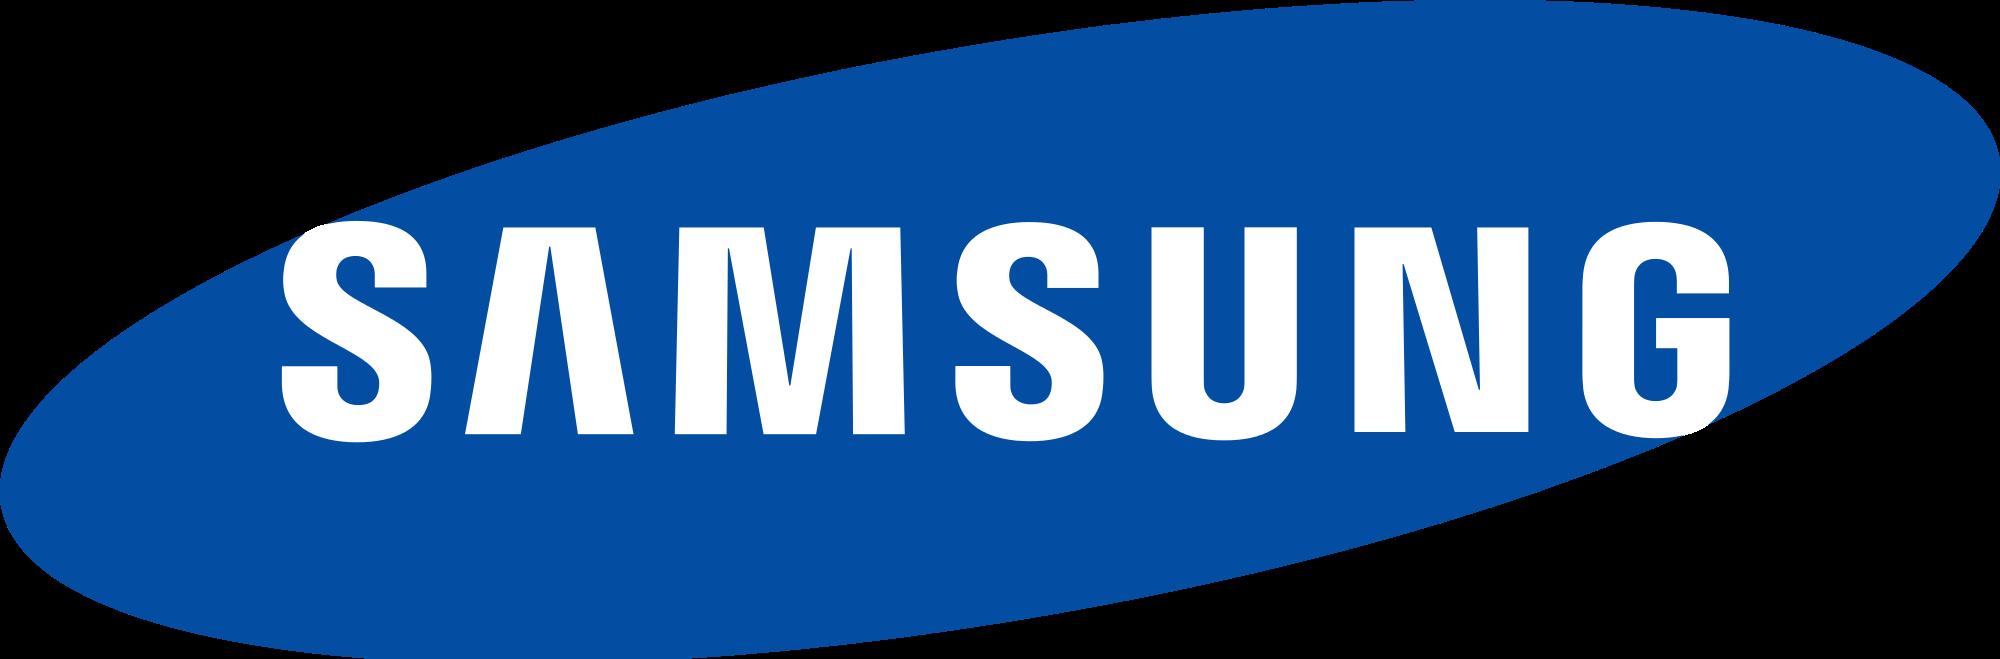 логотип самсунг фото имеет огромное количество